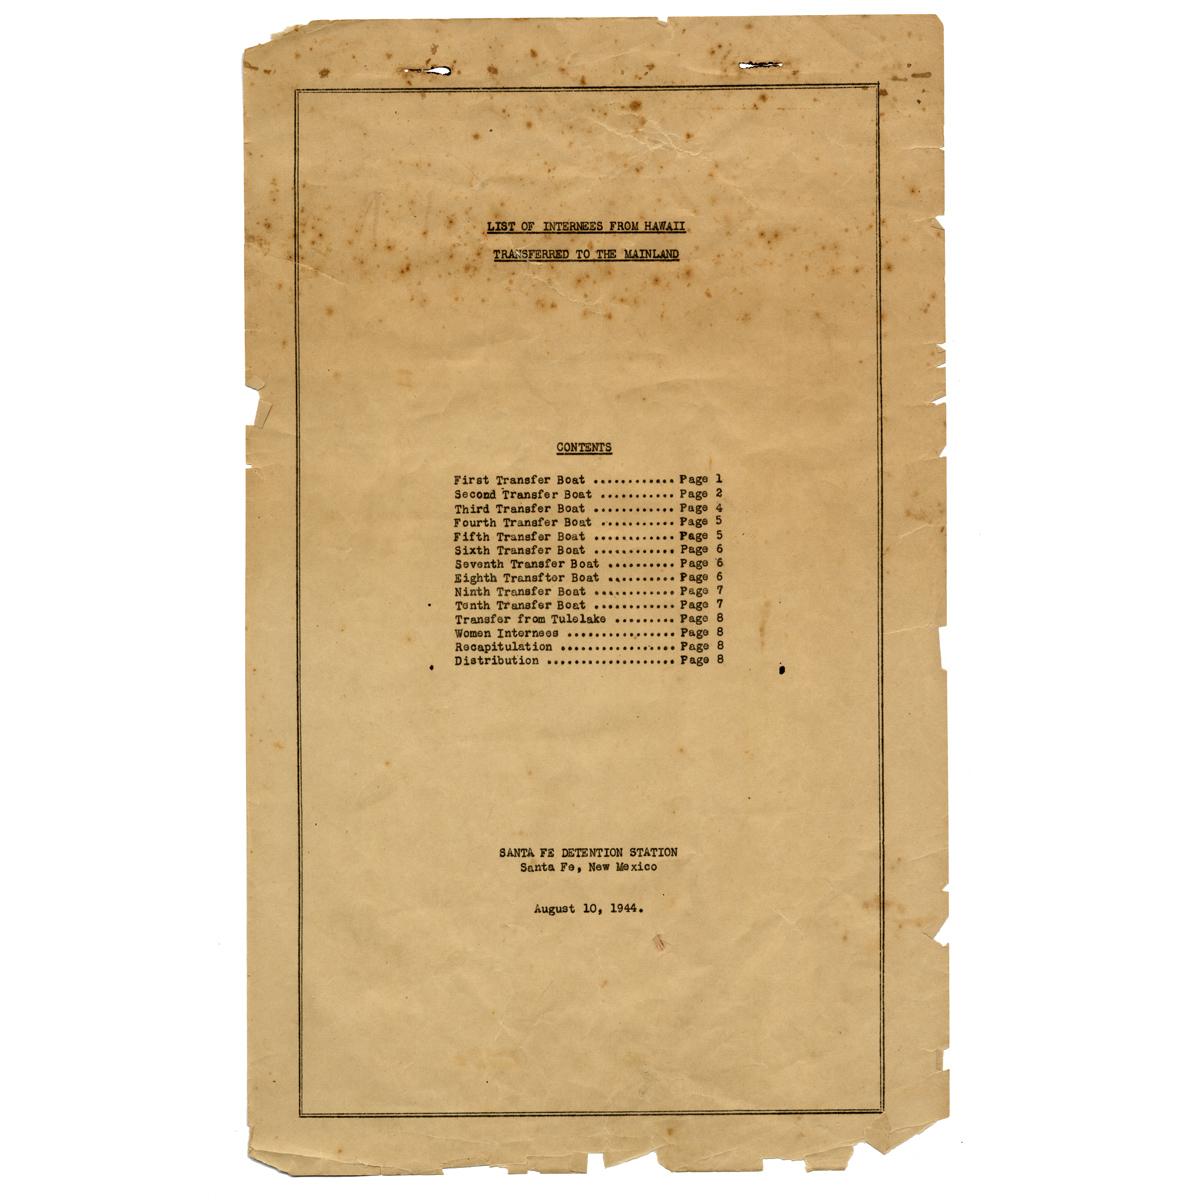 List of internees from Hawai'i, 1944